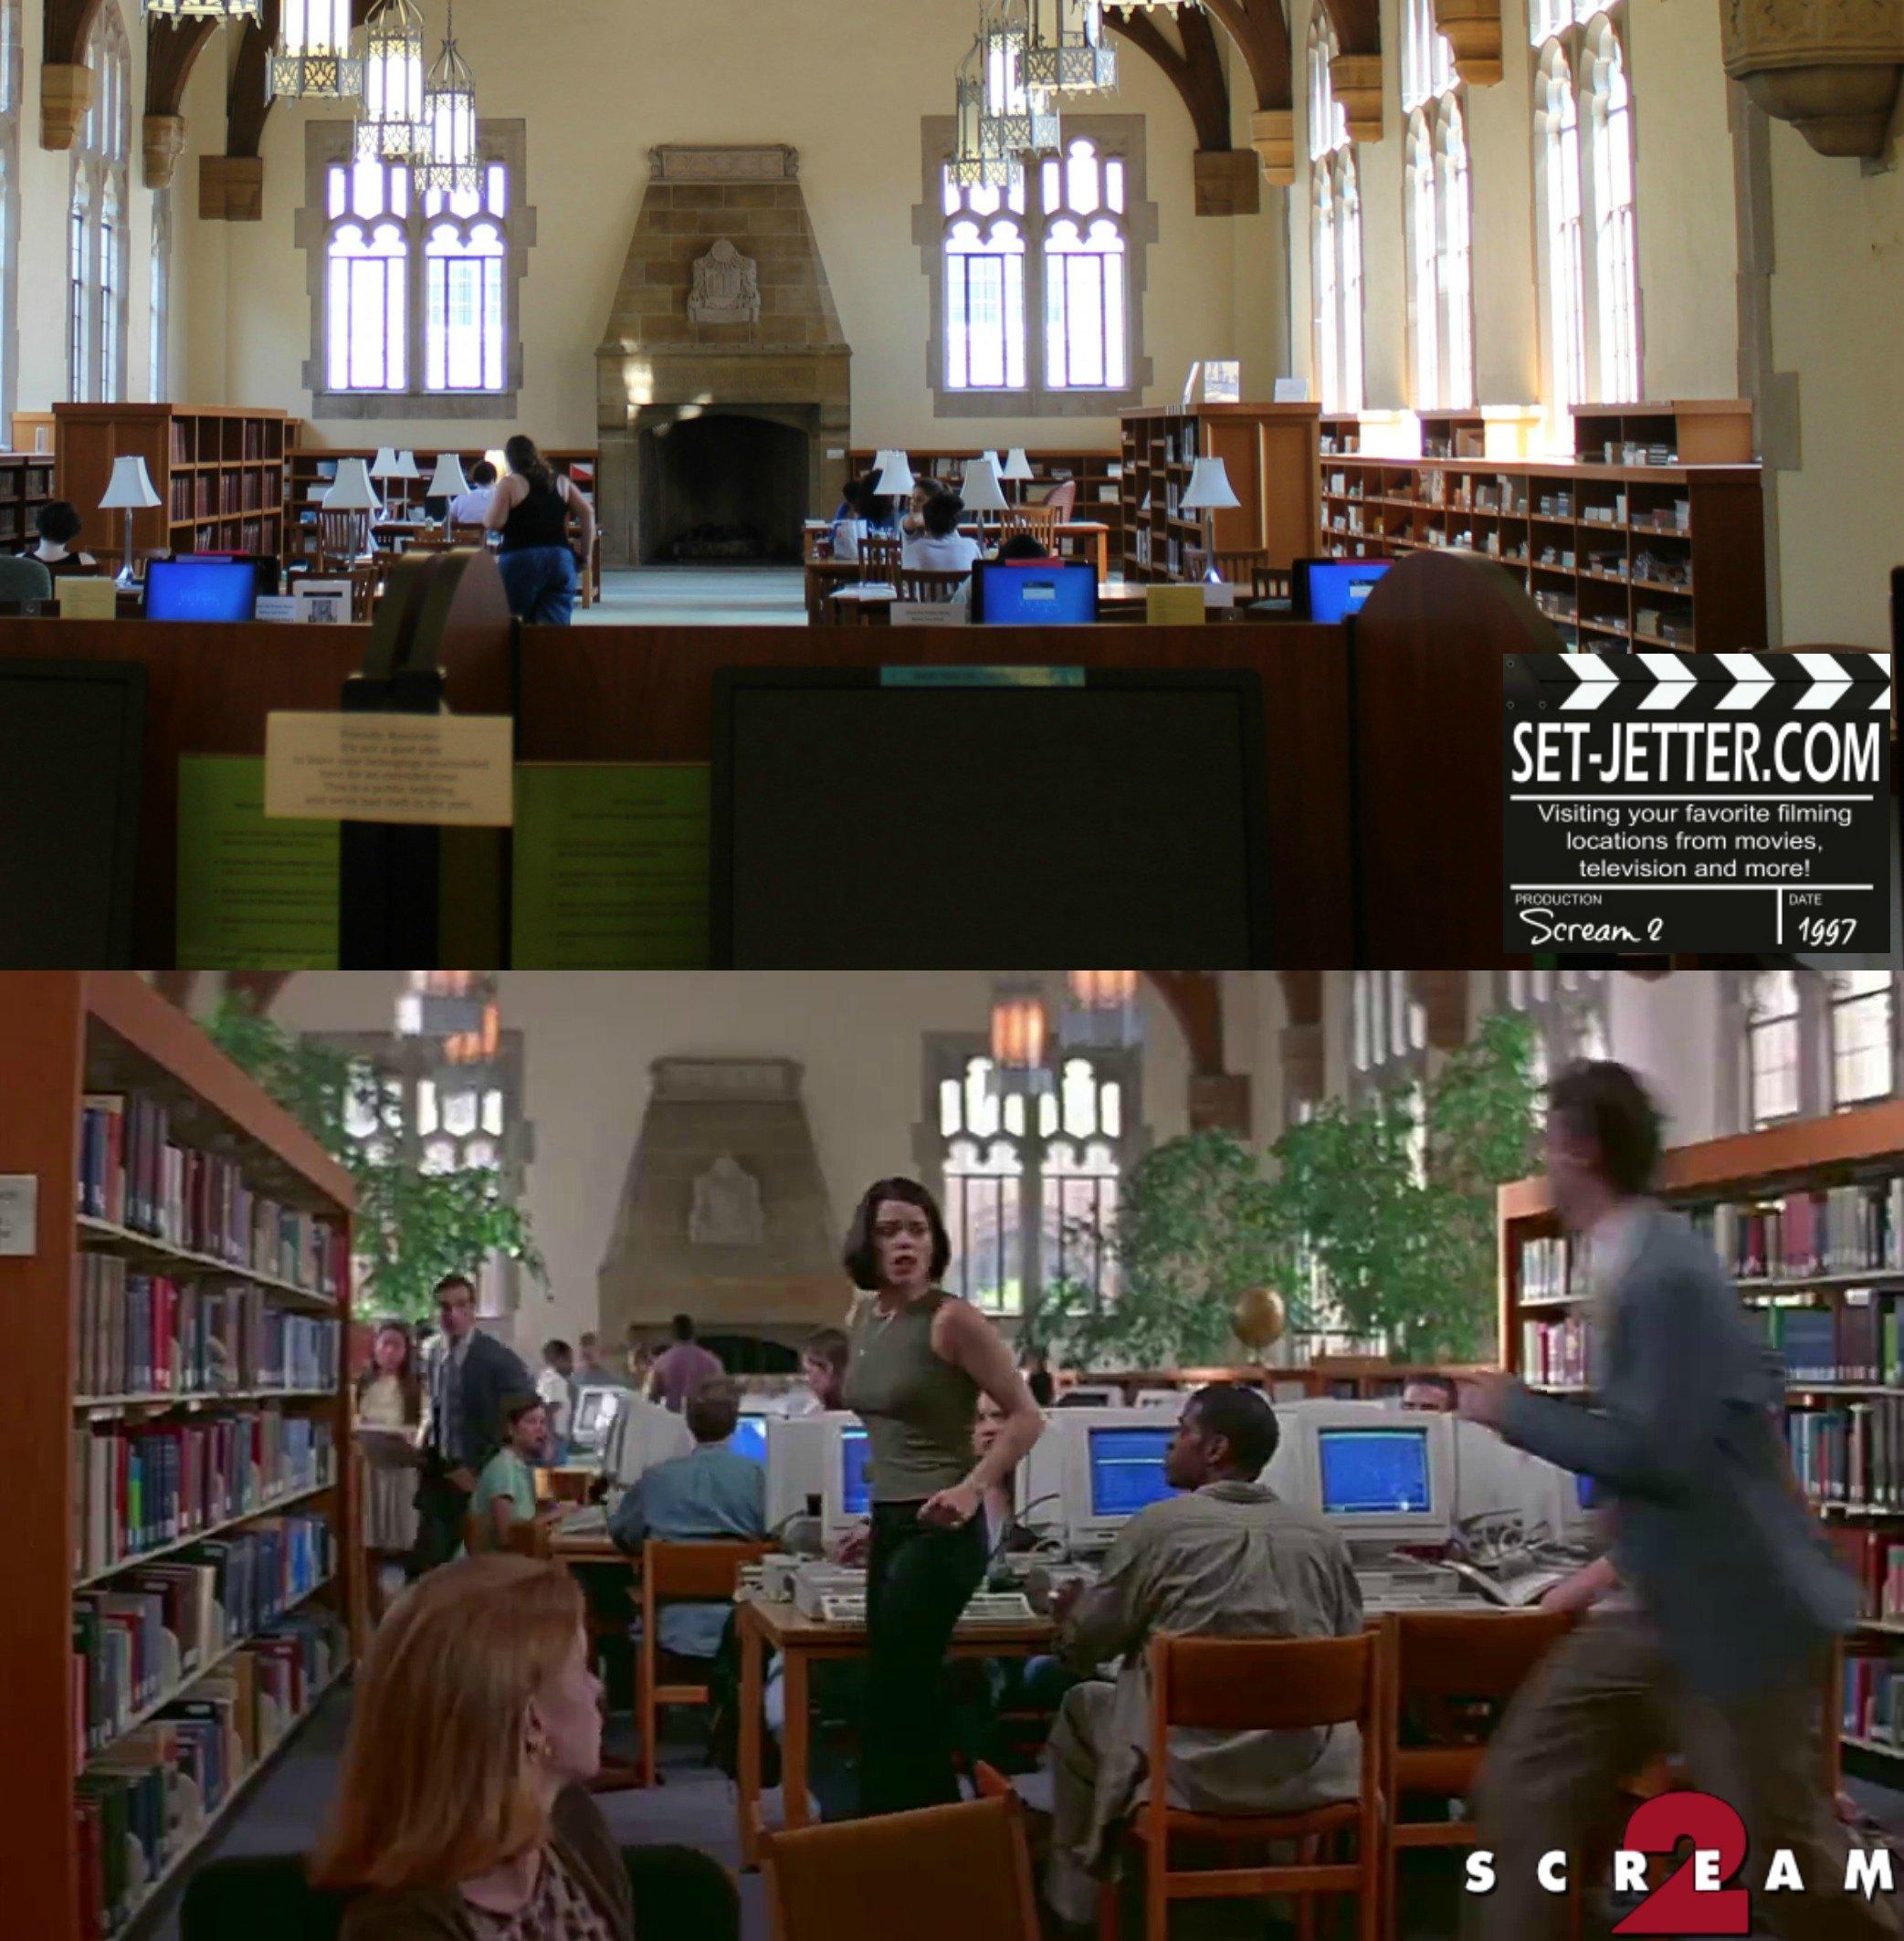 Scream 2 comparison 181.jpg